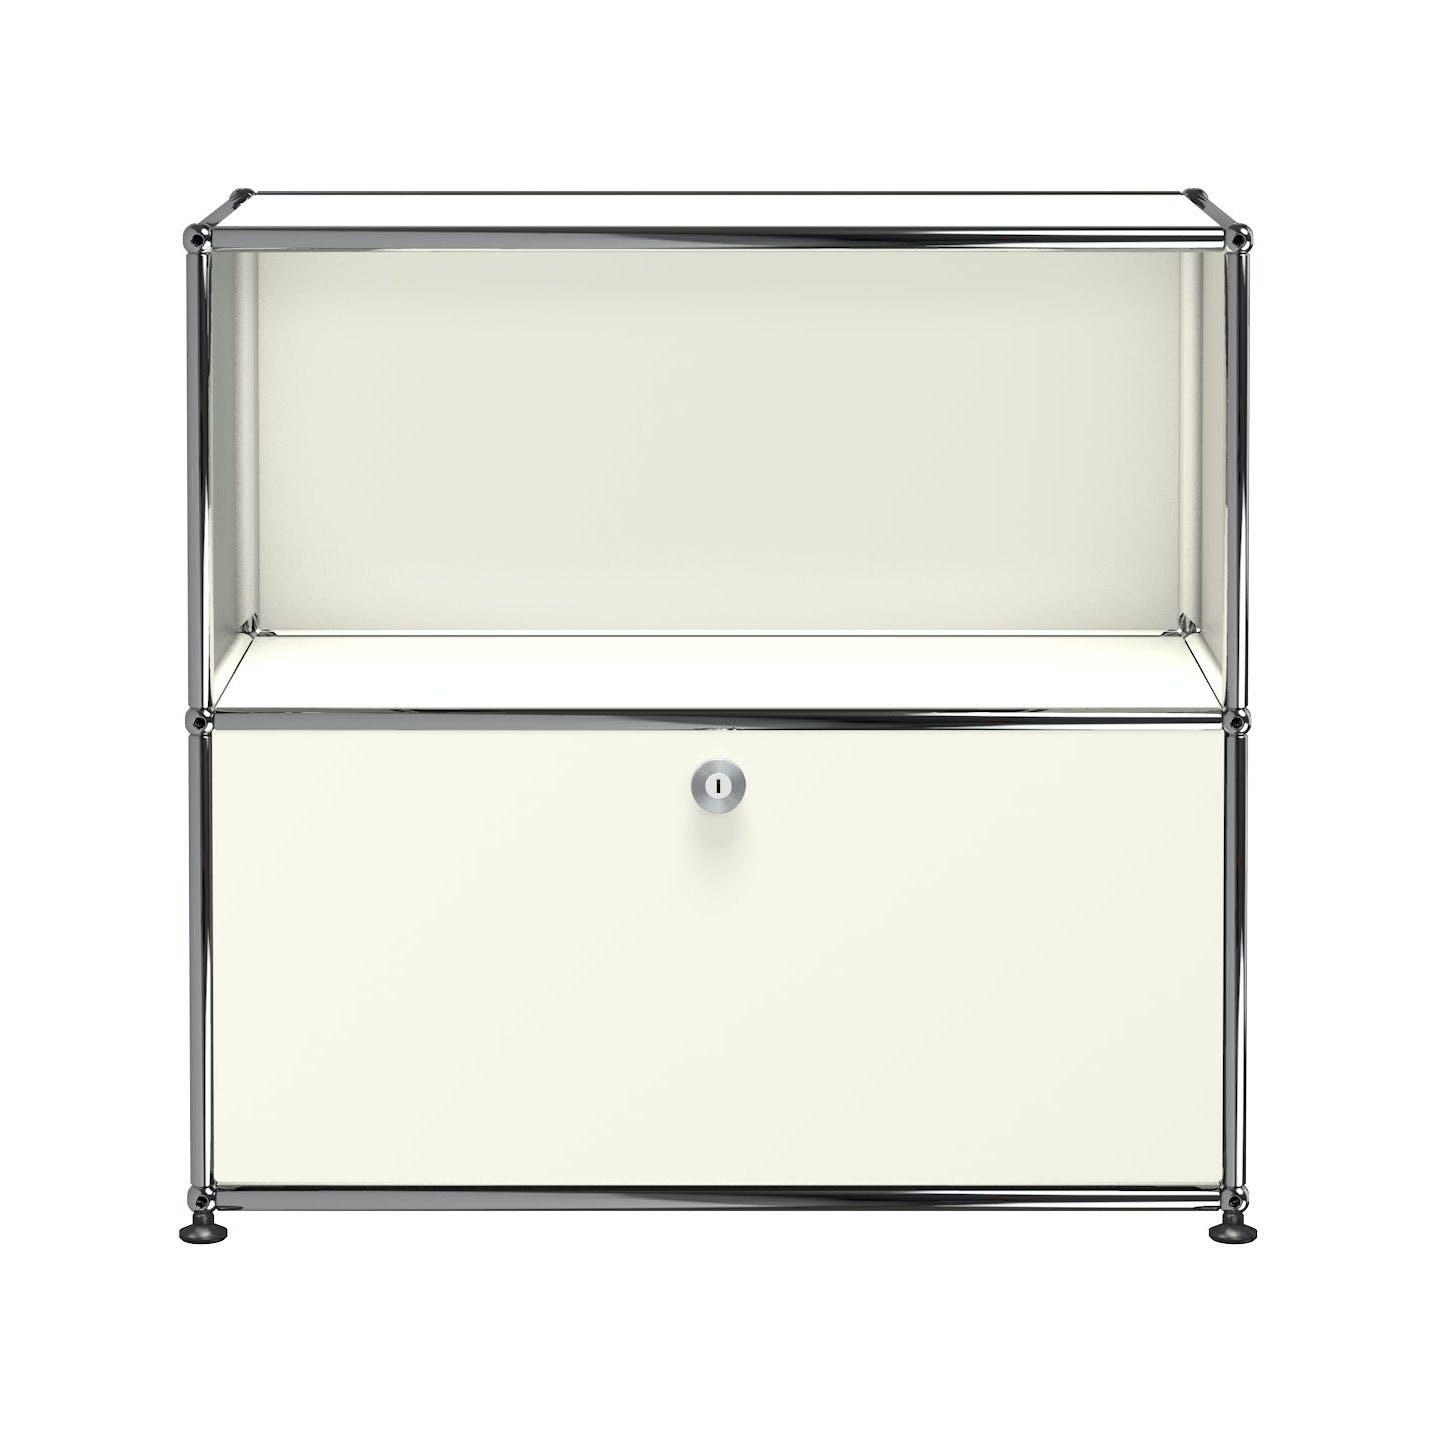 Usm-quick-ship-Haller-Storage-C1B-white-haute-living